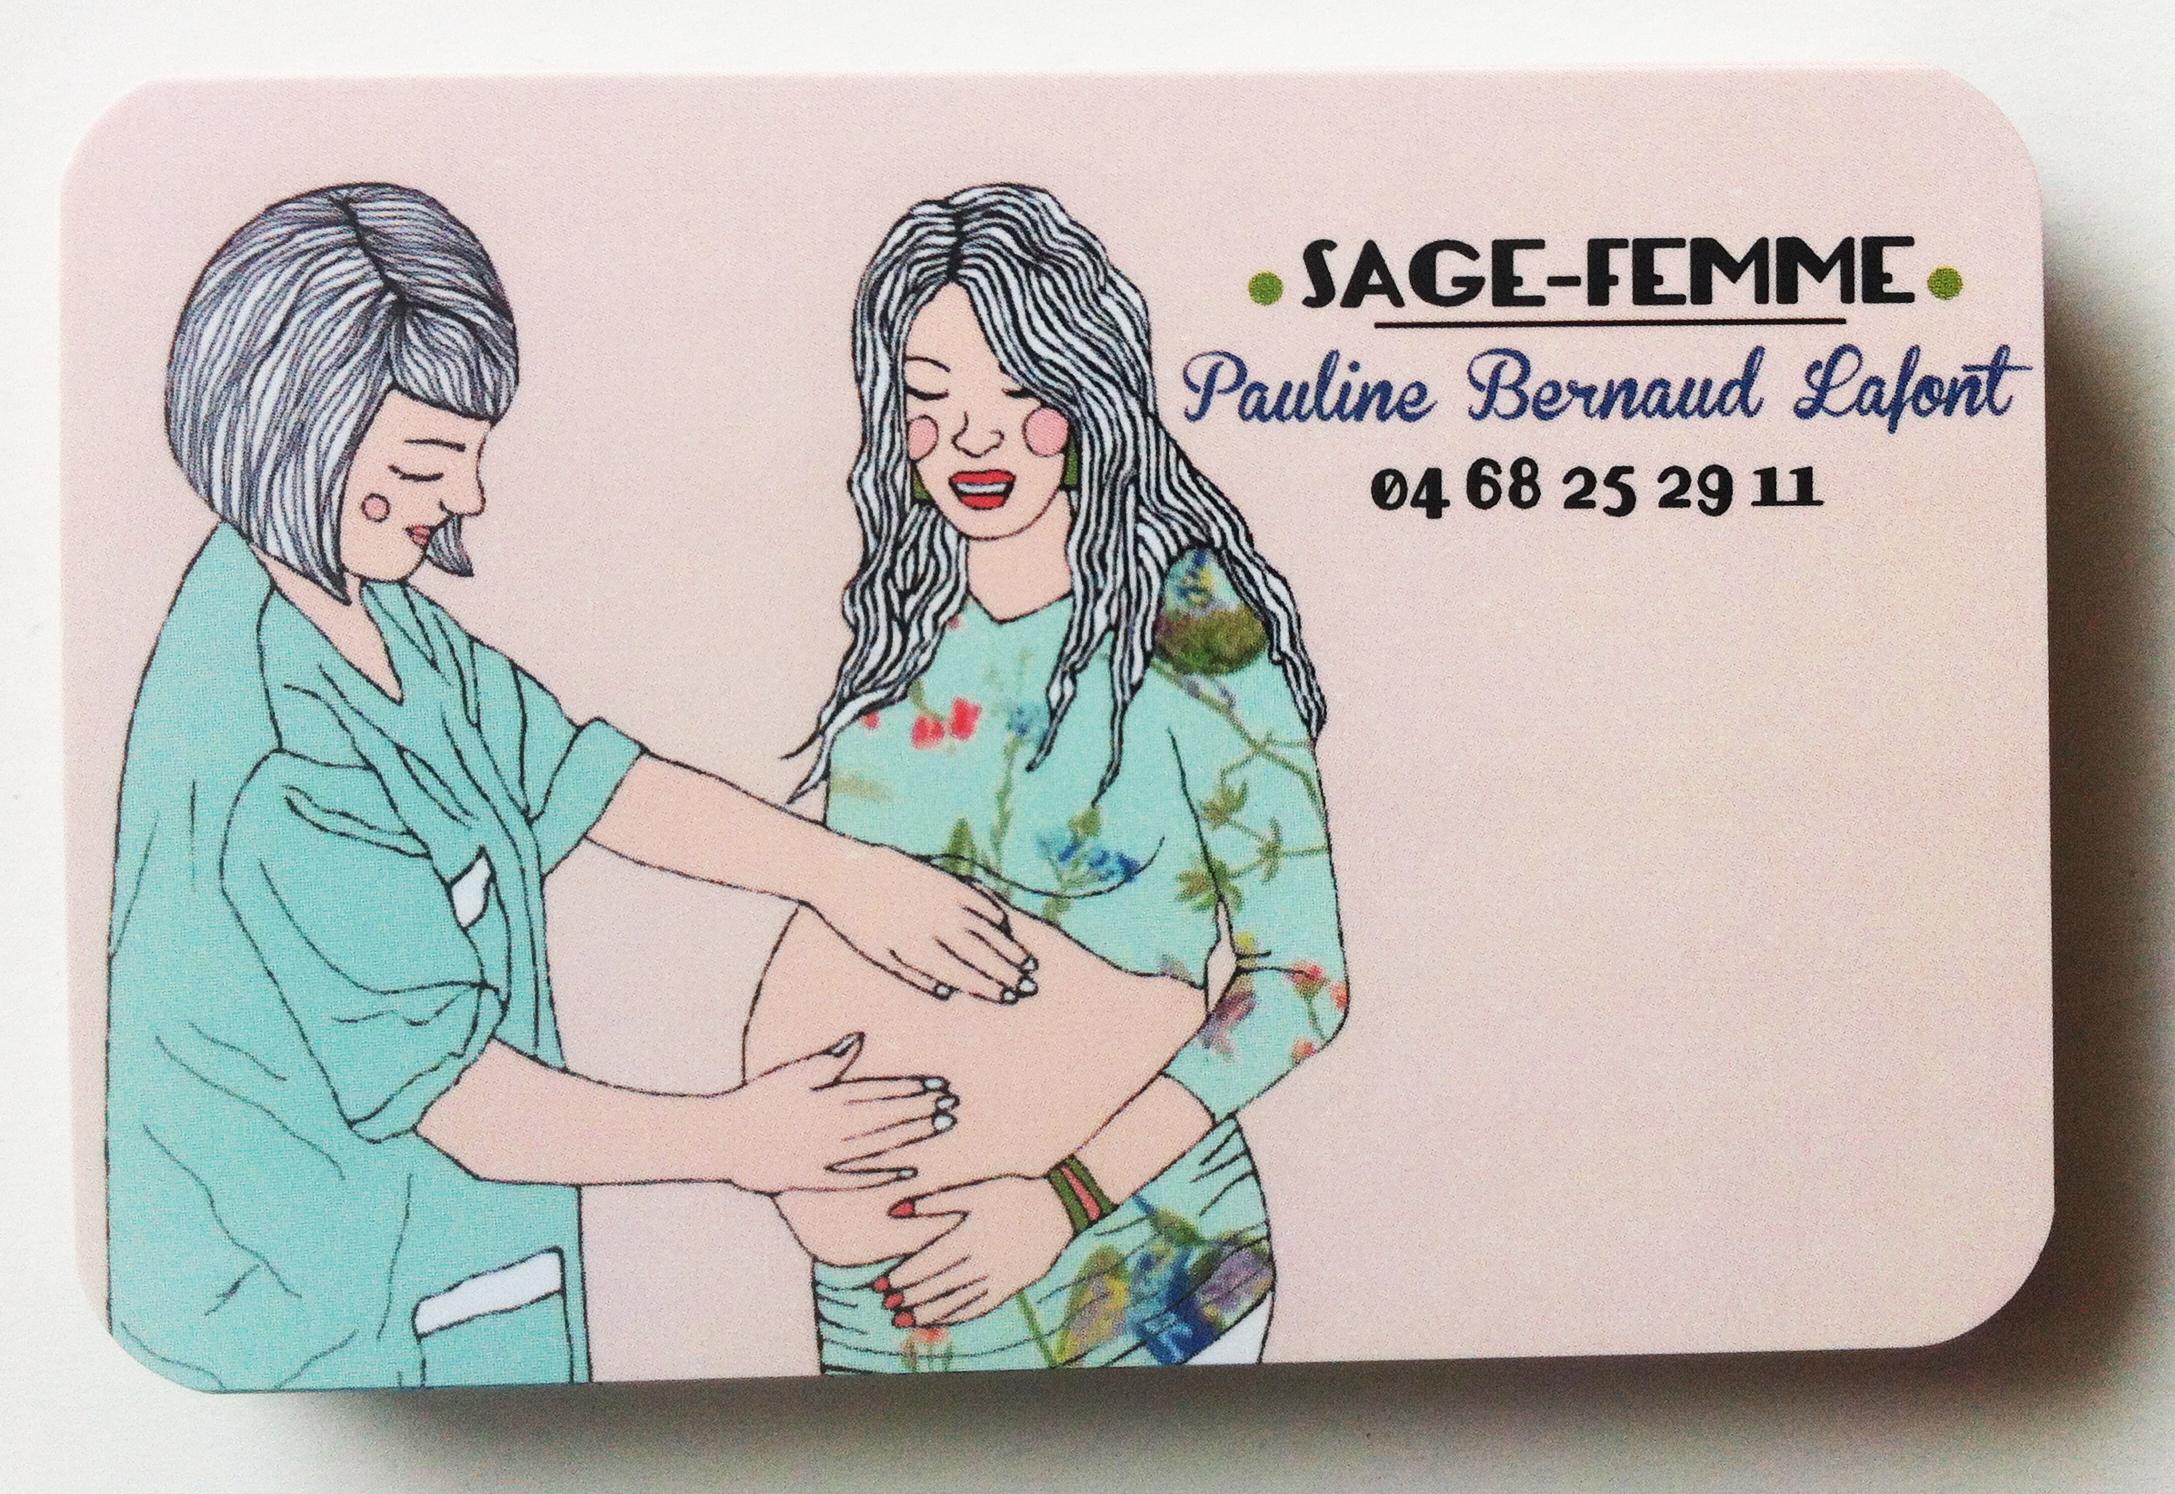 carte visite originale sage-femme